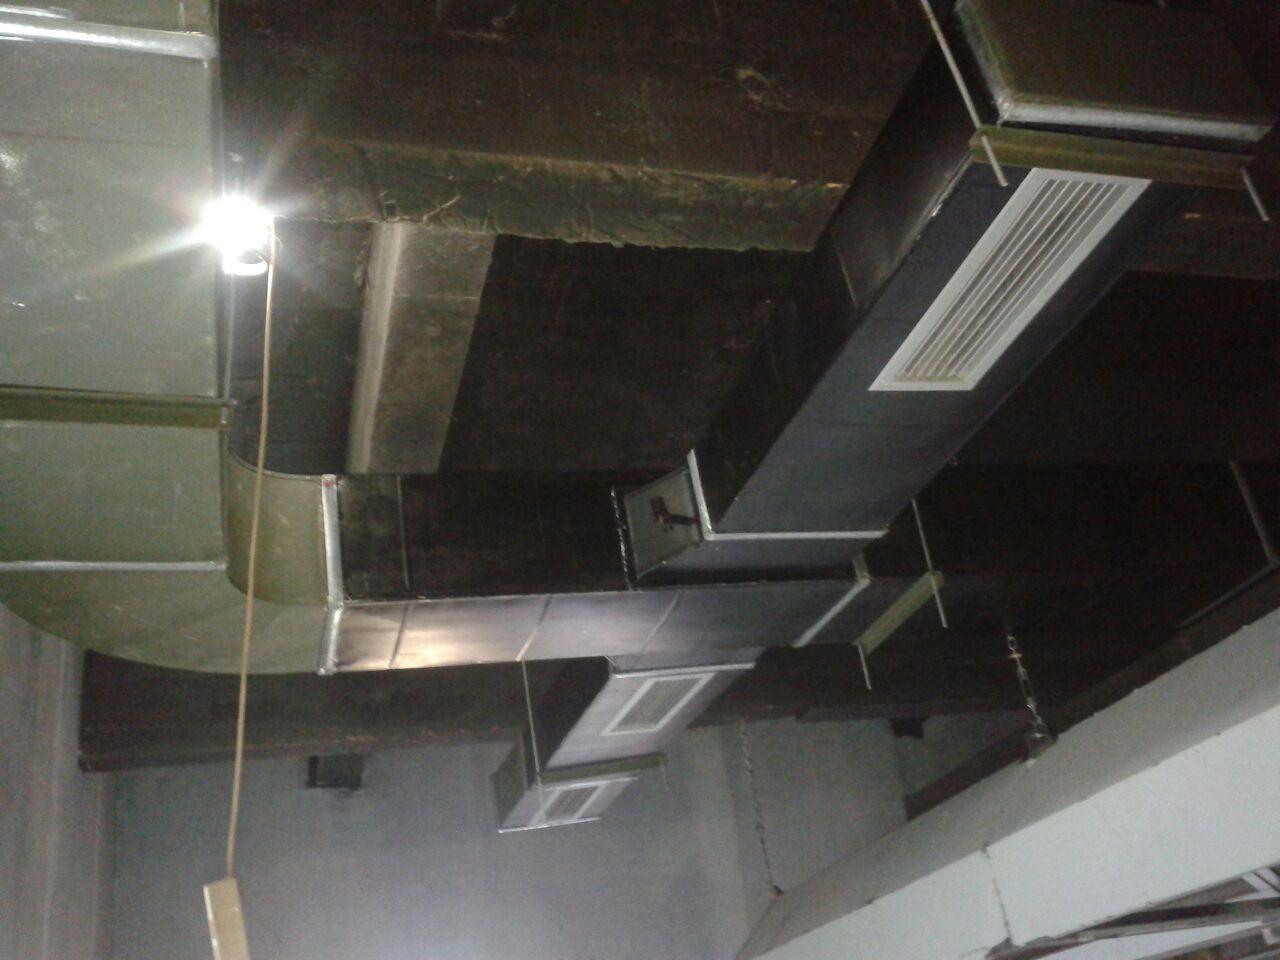 Aries Kitchen Mengerjakan Pembuatan Exhaust Hood Dan Instalasi Ducting Serta Pemasangan Fan Motor Untuk Restoran Dengan Ukuran Yang Di Sesuaikan